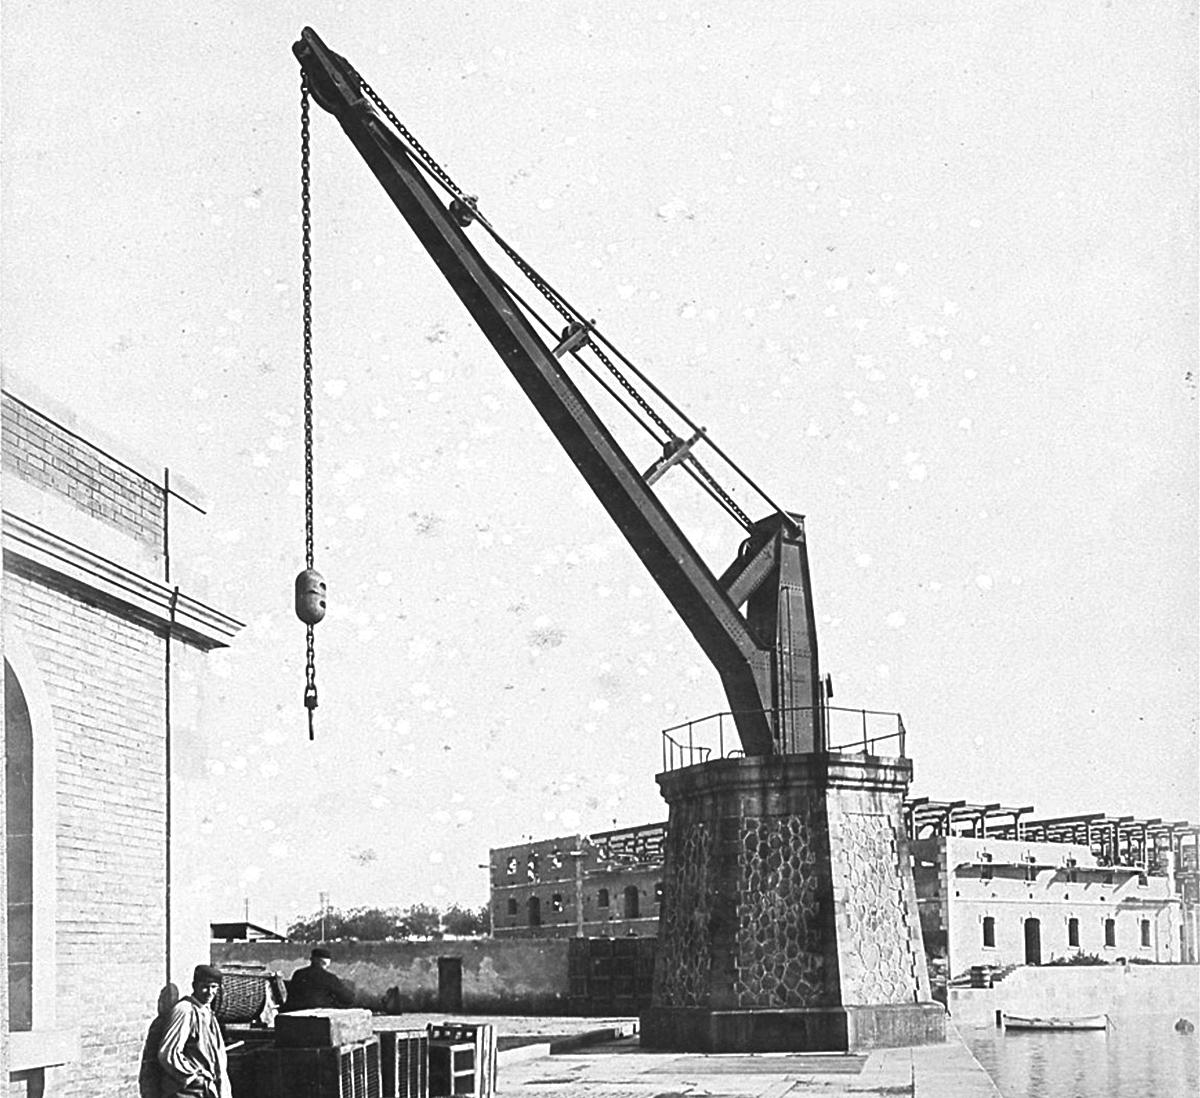 Grúa hidráulica de 25 toneladas en el puerto de Barcelona / Alabern. Fotografia de Catalunya (Autor: Pau Audouard)